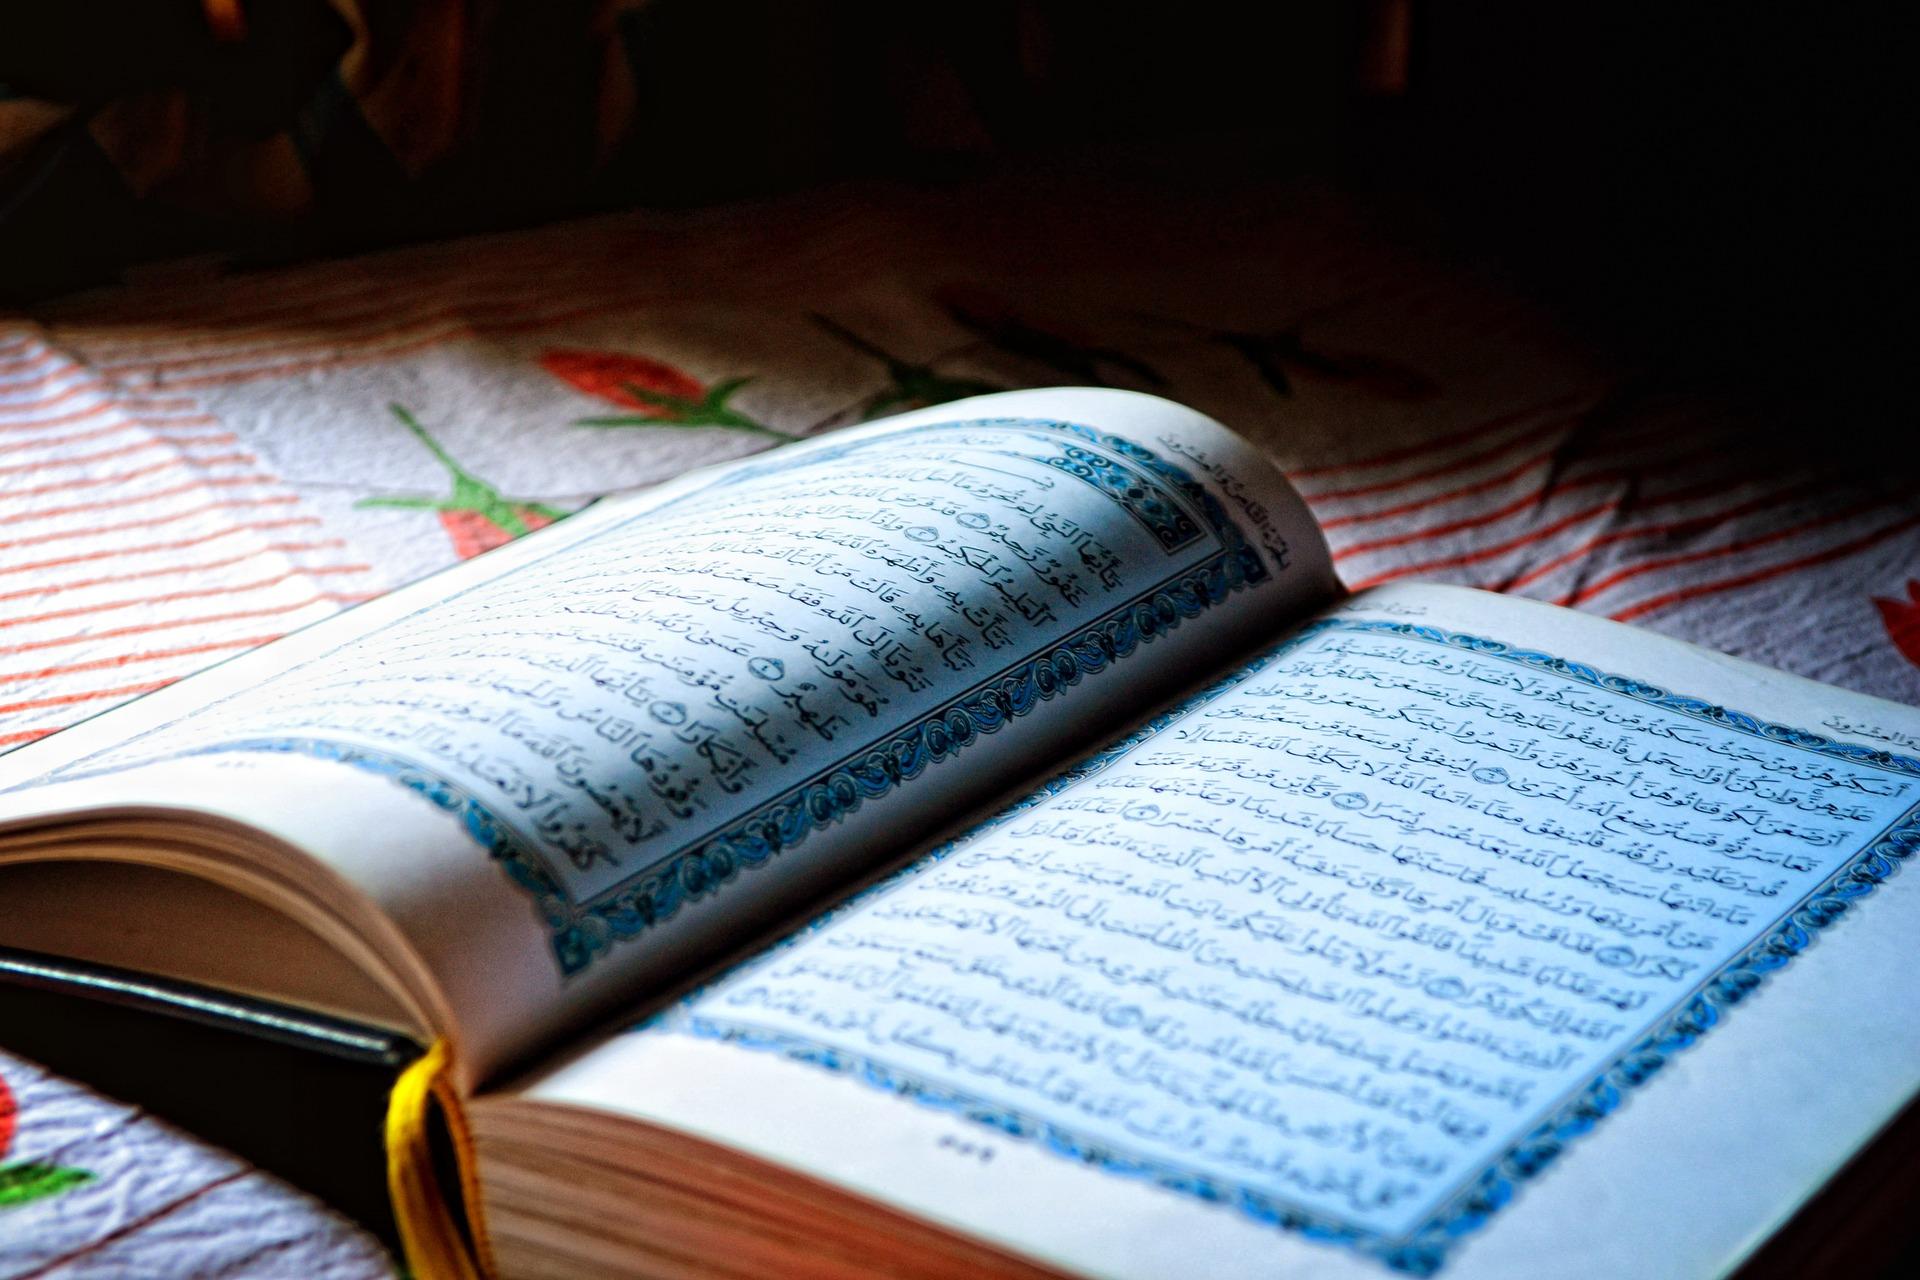 the Quran.jpg